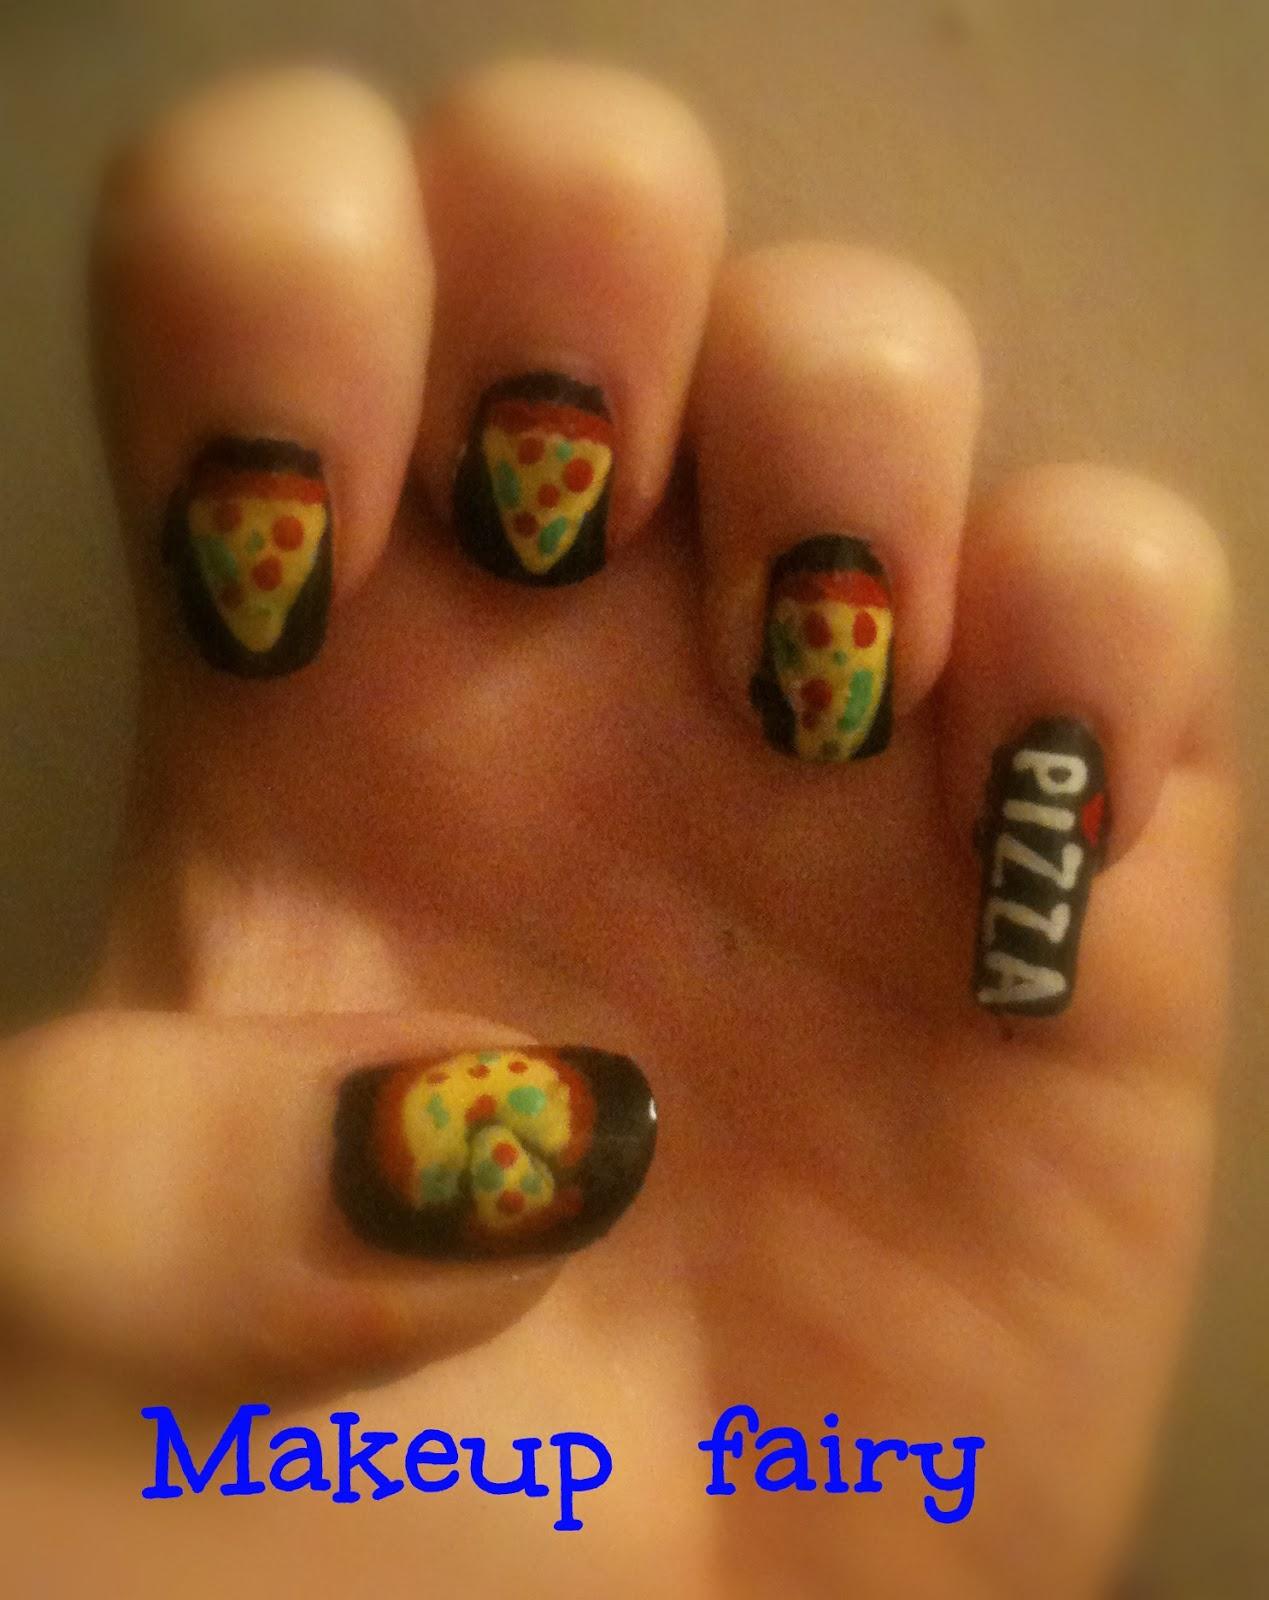 Tinklesmakeup: Pizza nail art